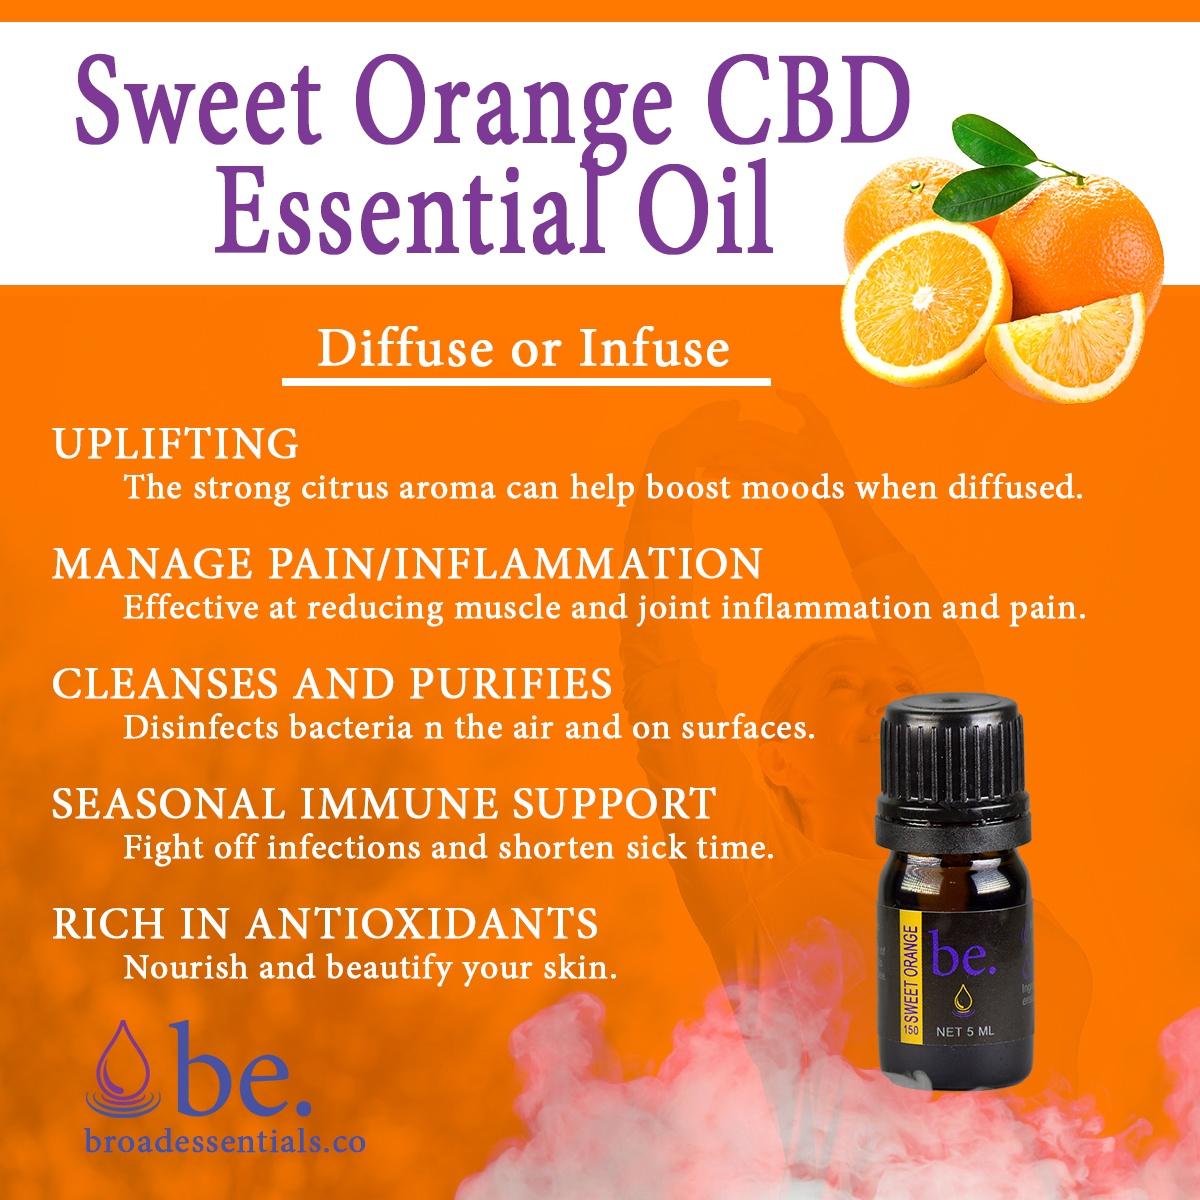 Sweet Orange CBD Essential Oil Infographic